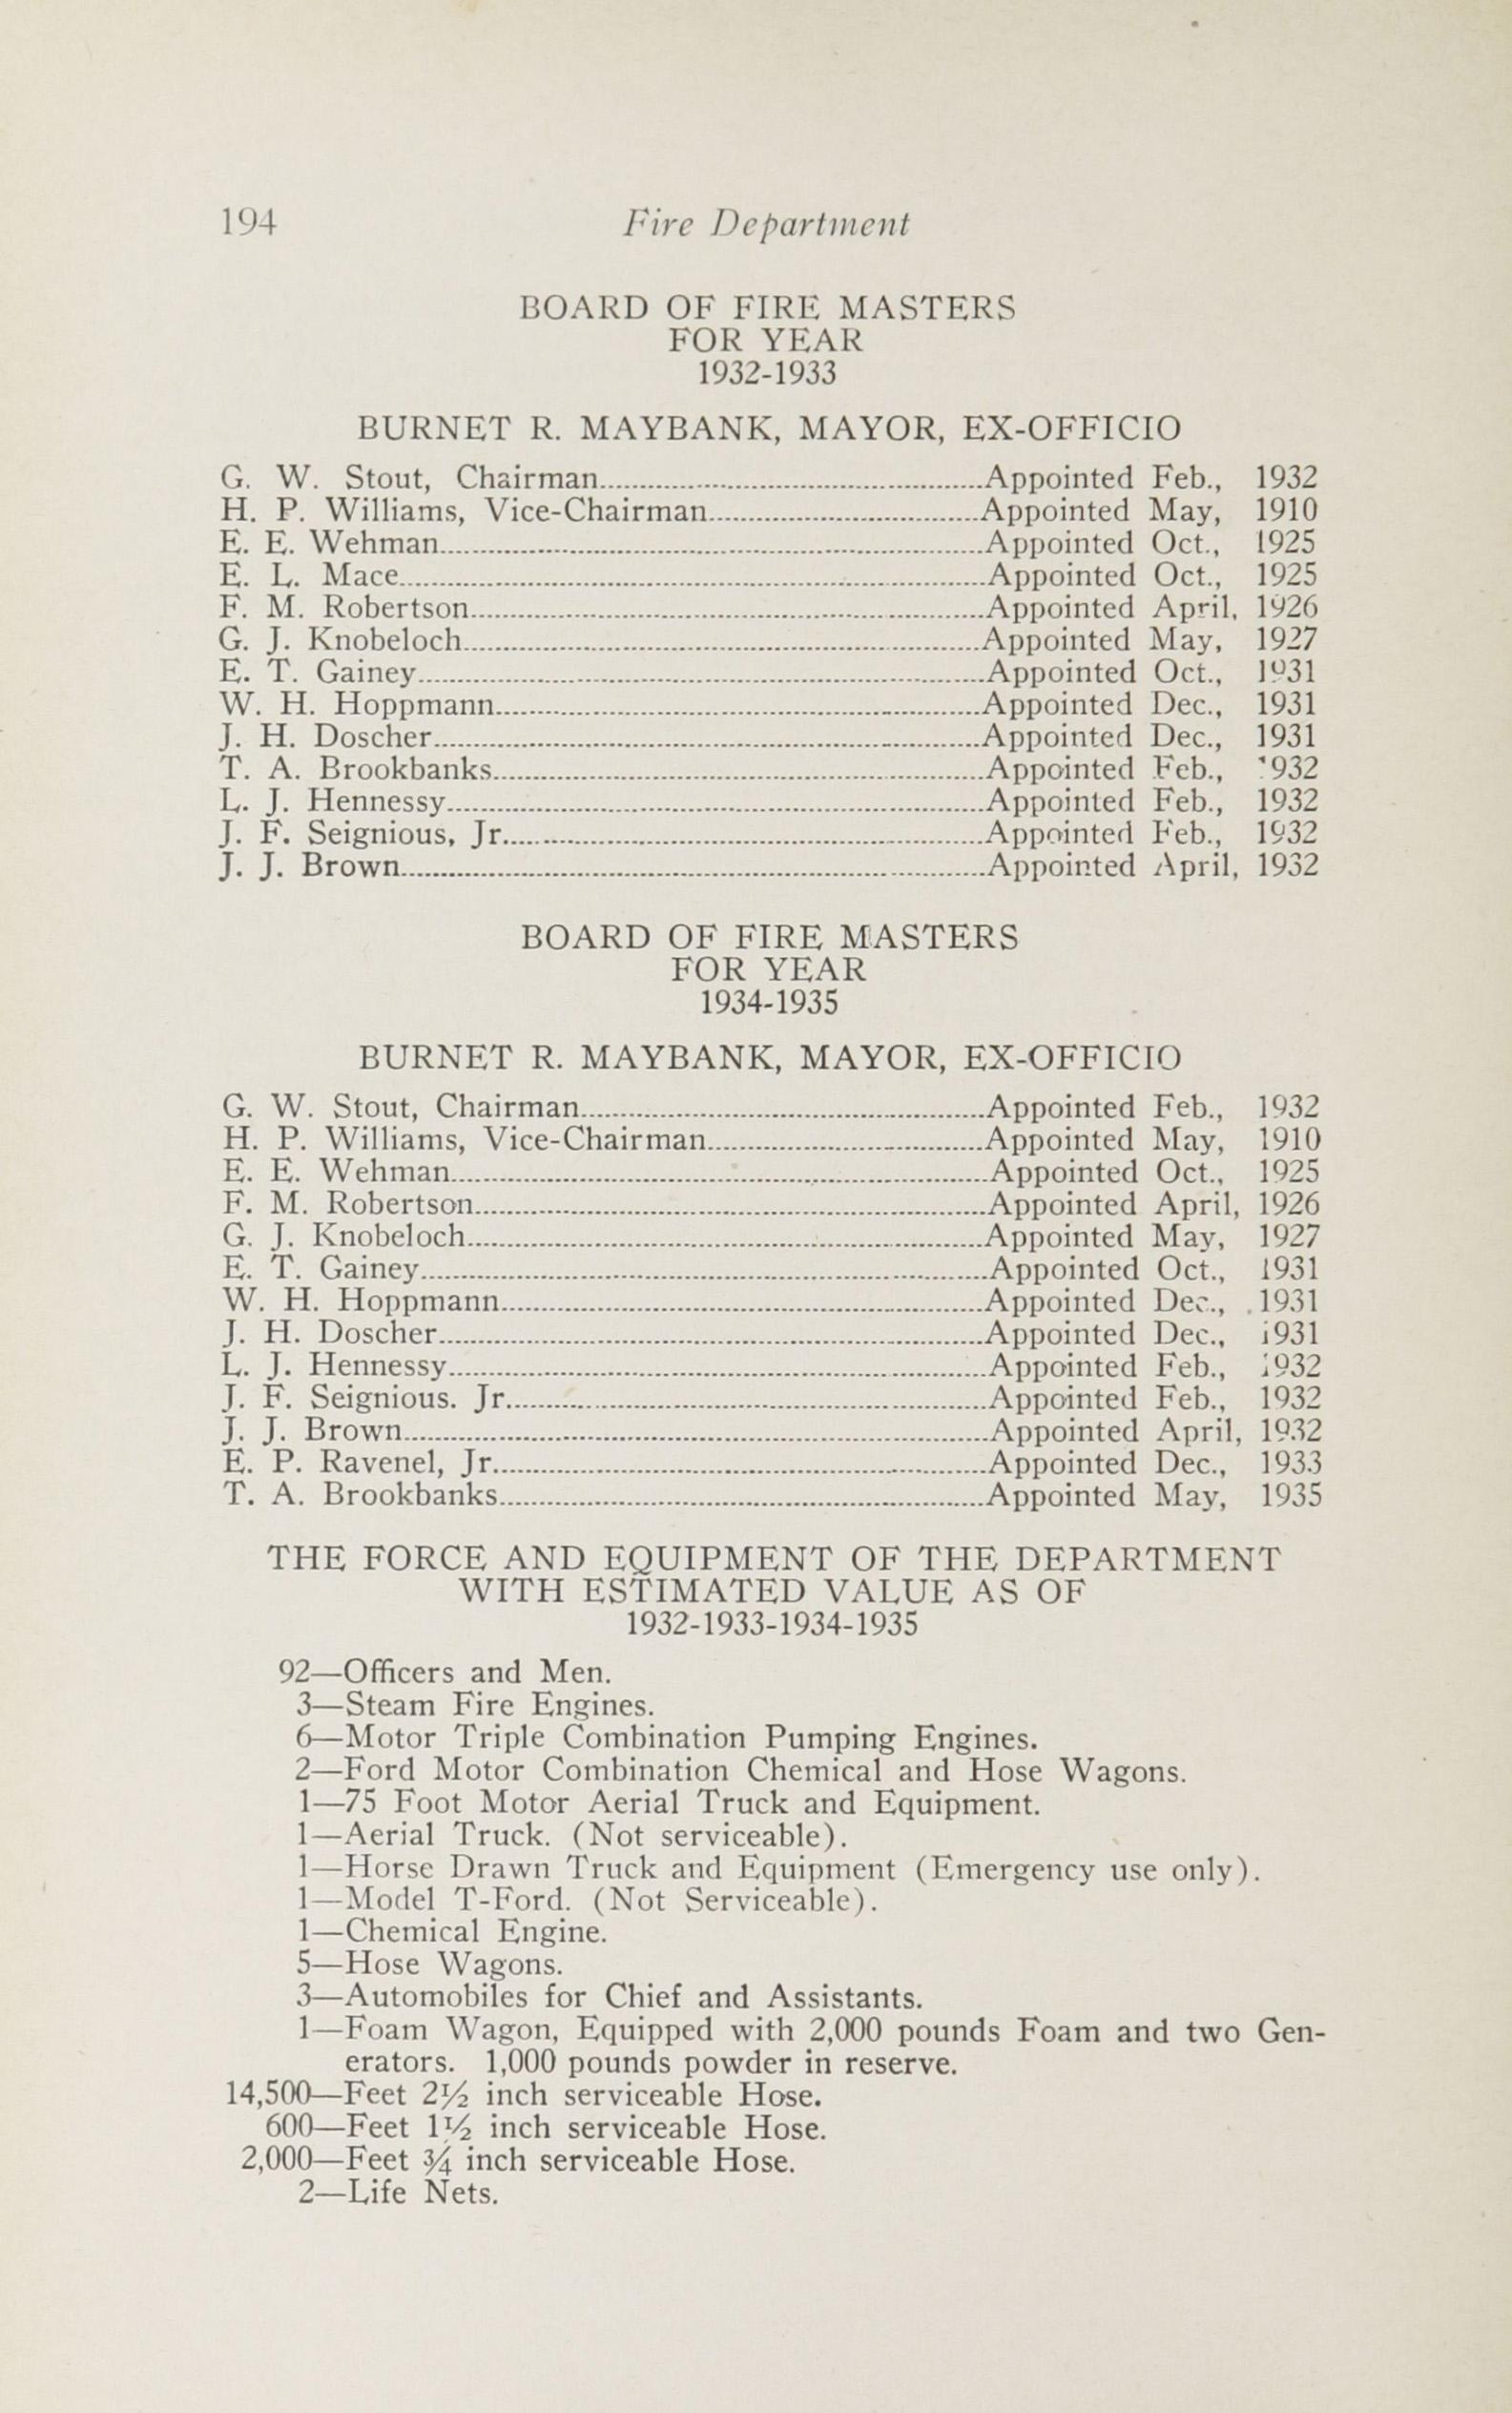 Charleston Yearbook, 1932-1935, page 194